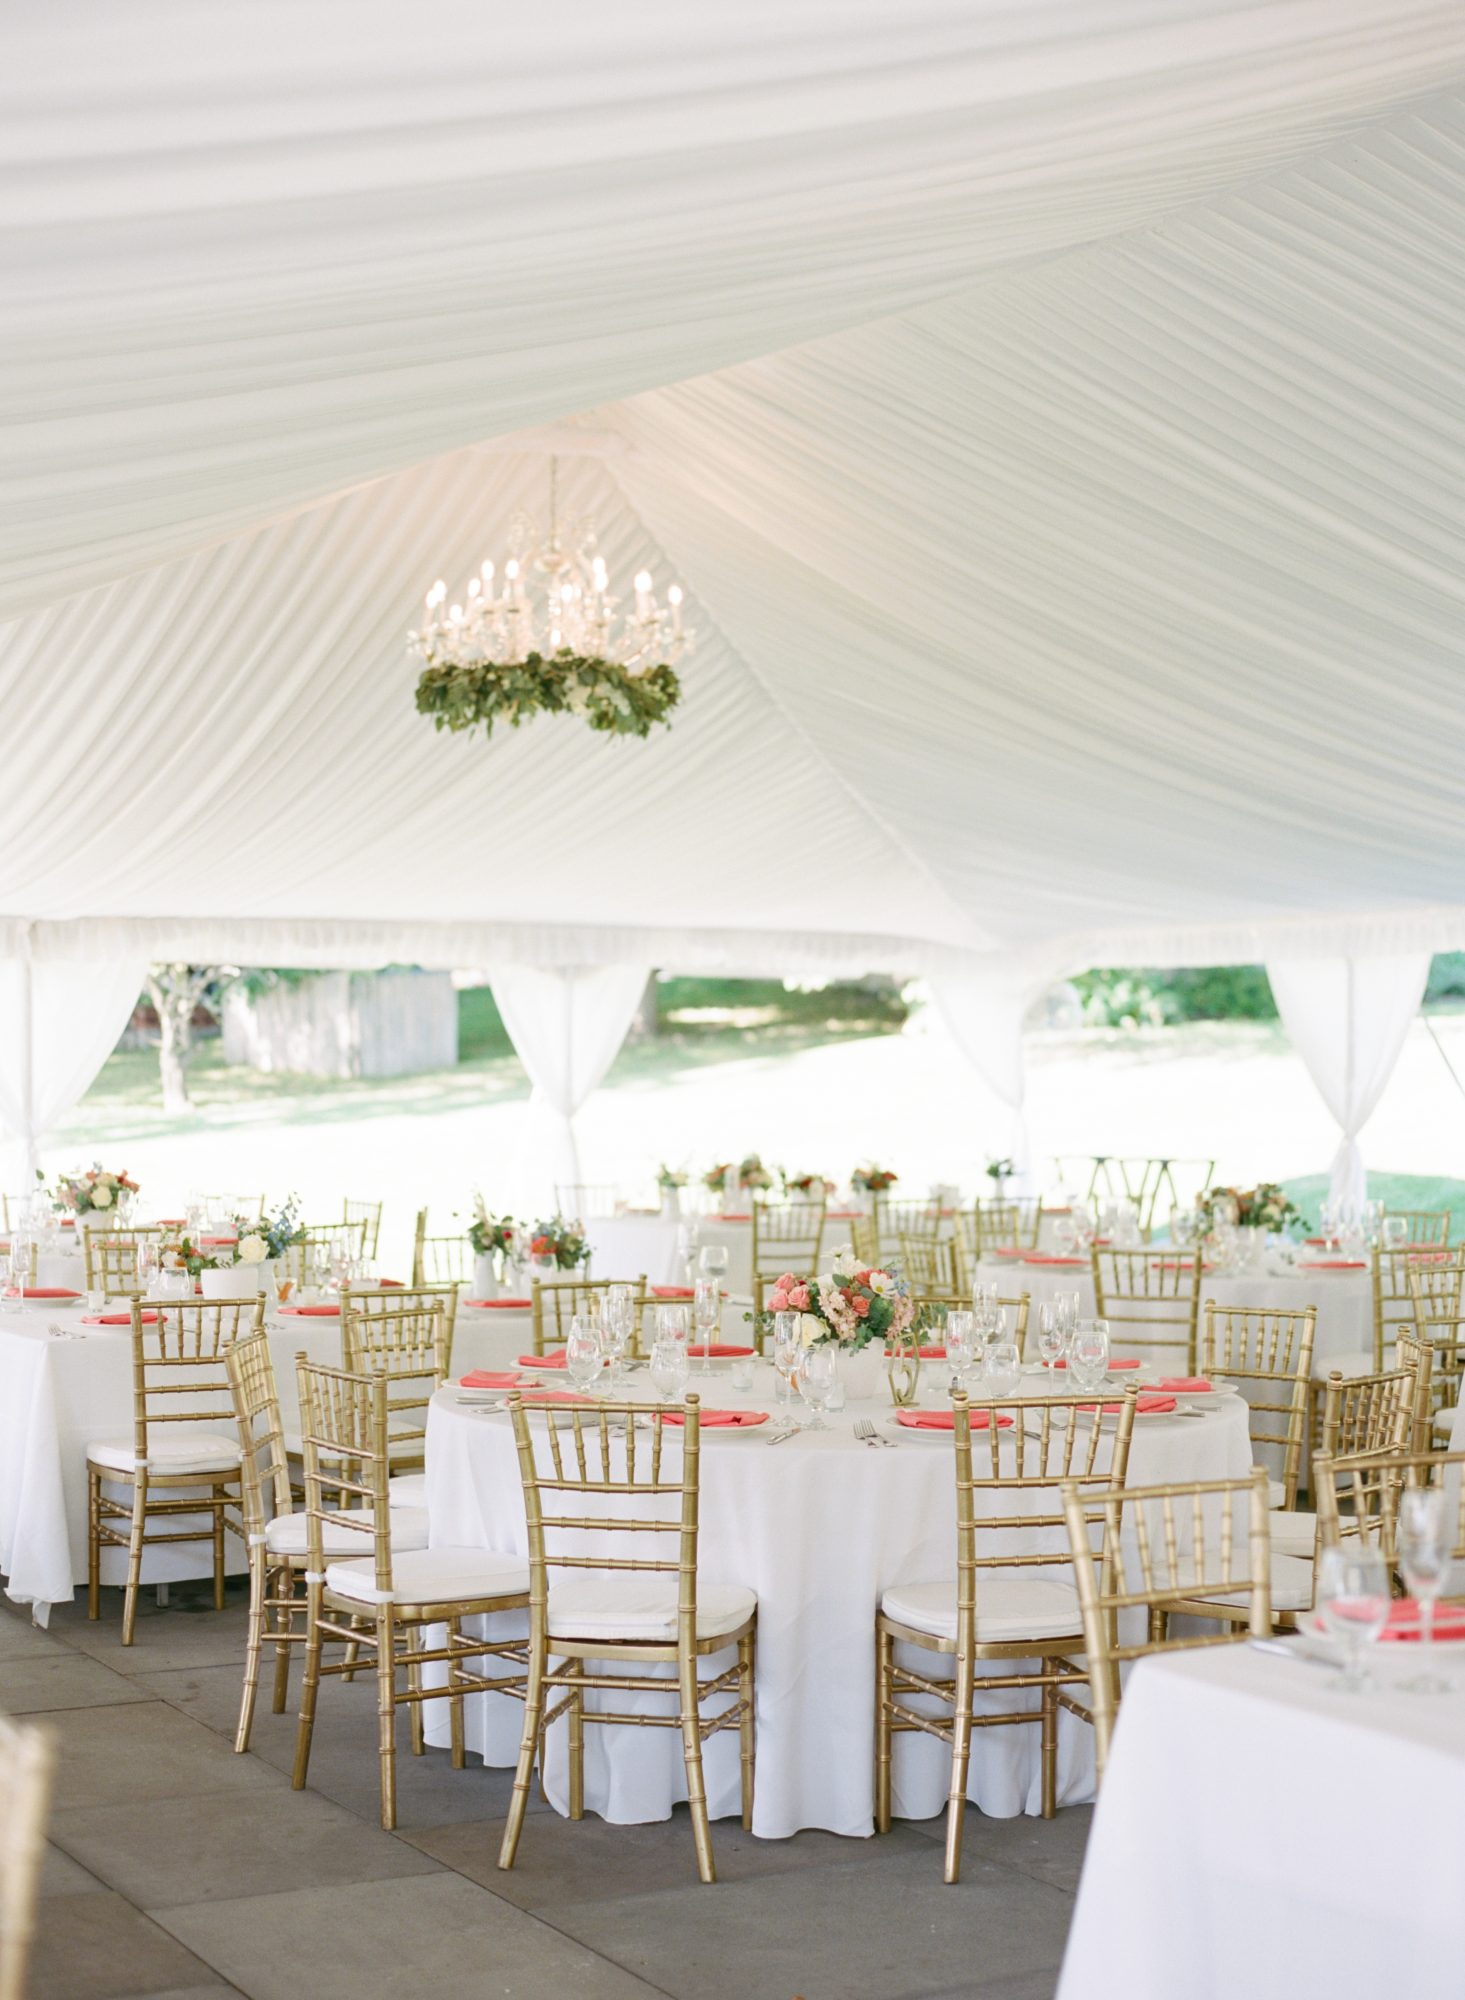 charlene jeremy wedding reception decor